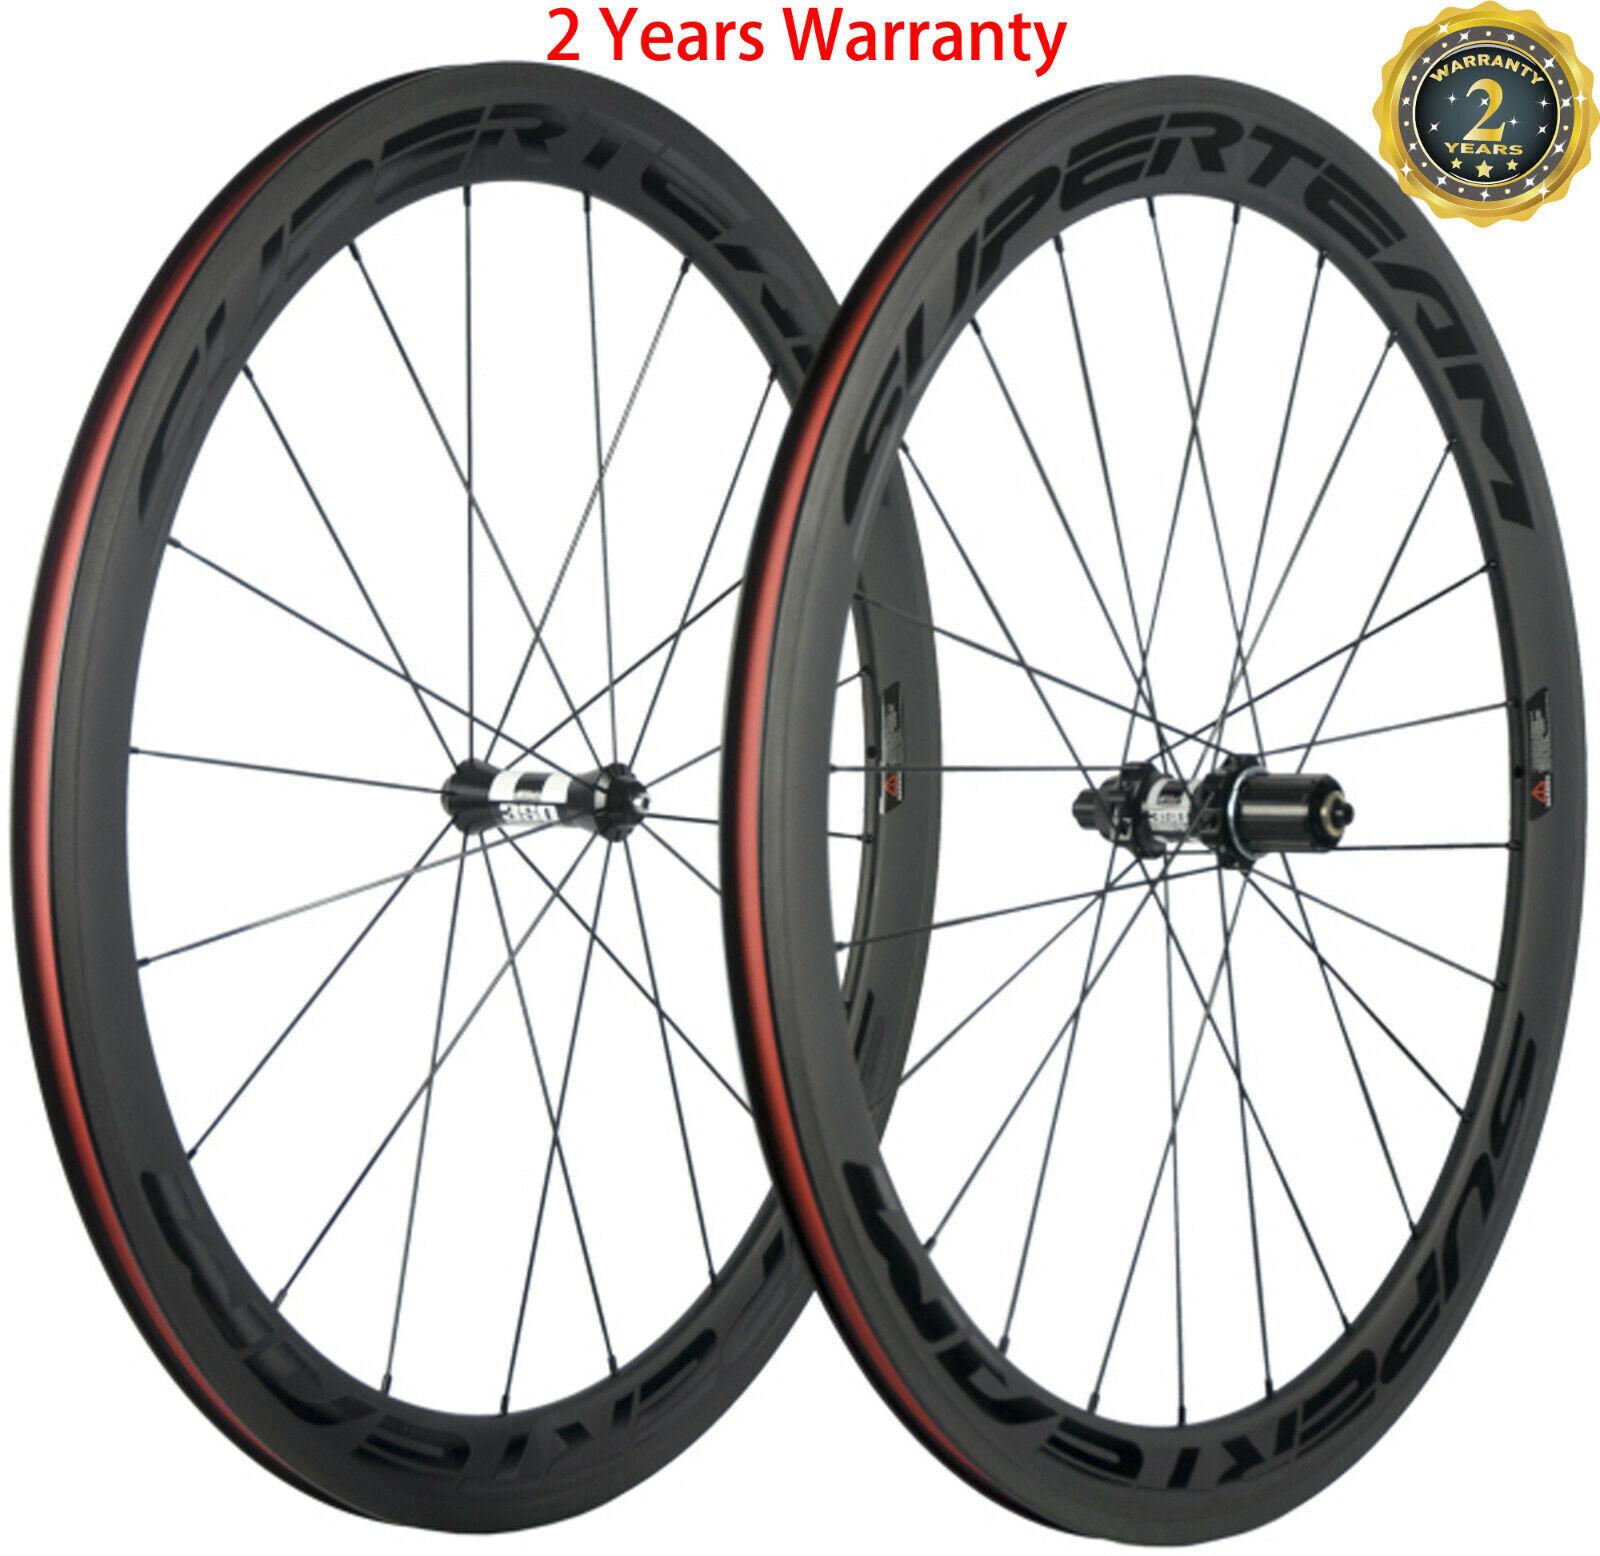 700C Clincher Carbon Road Bike Wheelset 50mm DT350s Hub Basalt Braking Surface